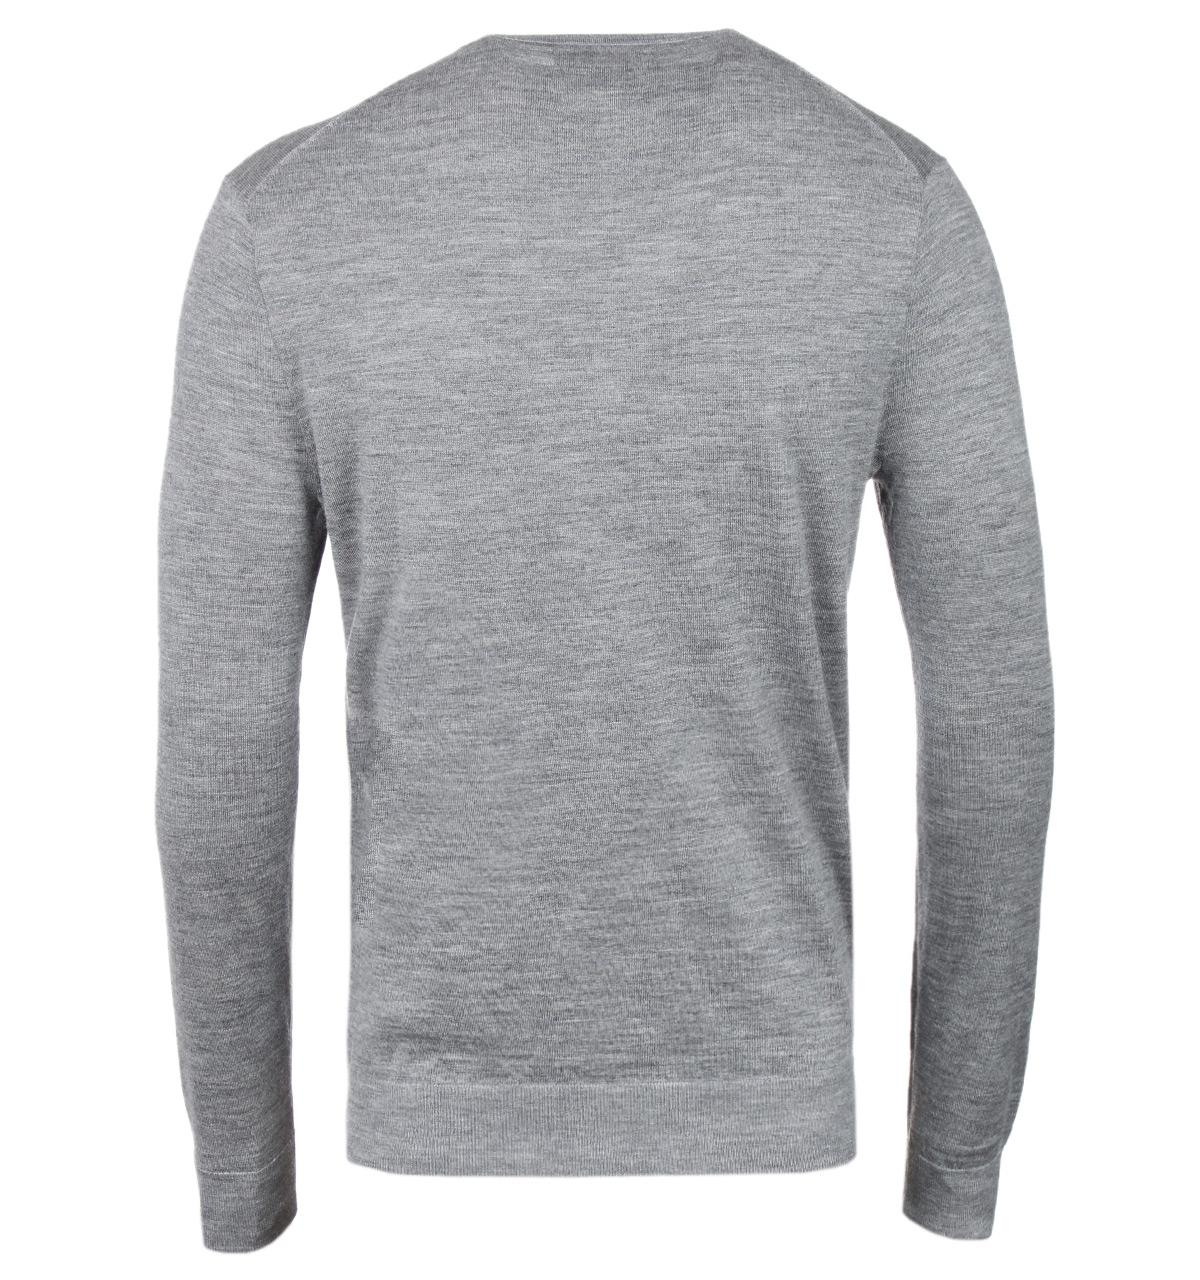 Polo Ralph Lauren Grey Merino Wool Crew Neck Knitted